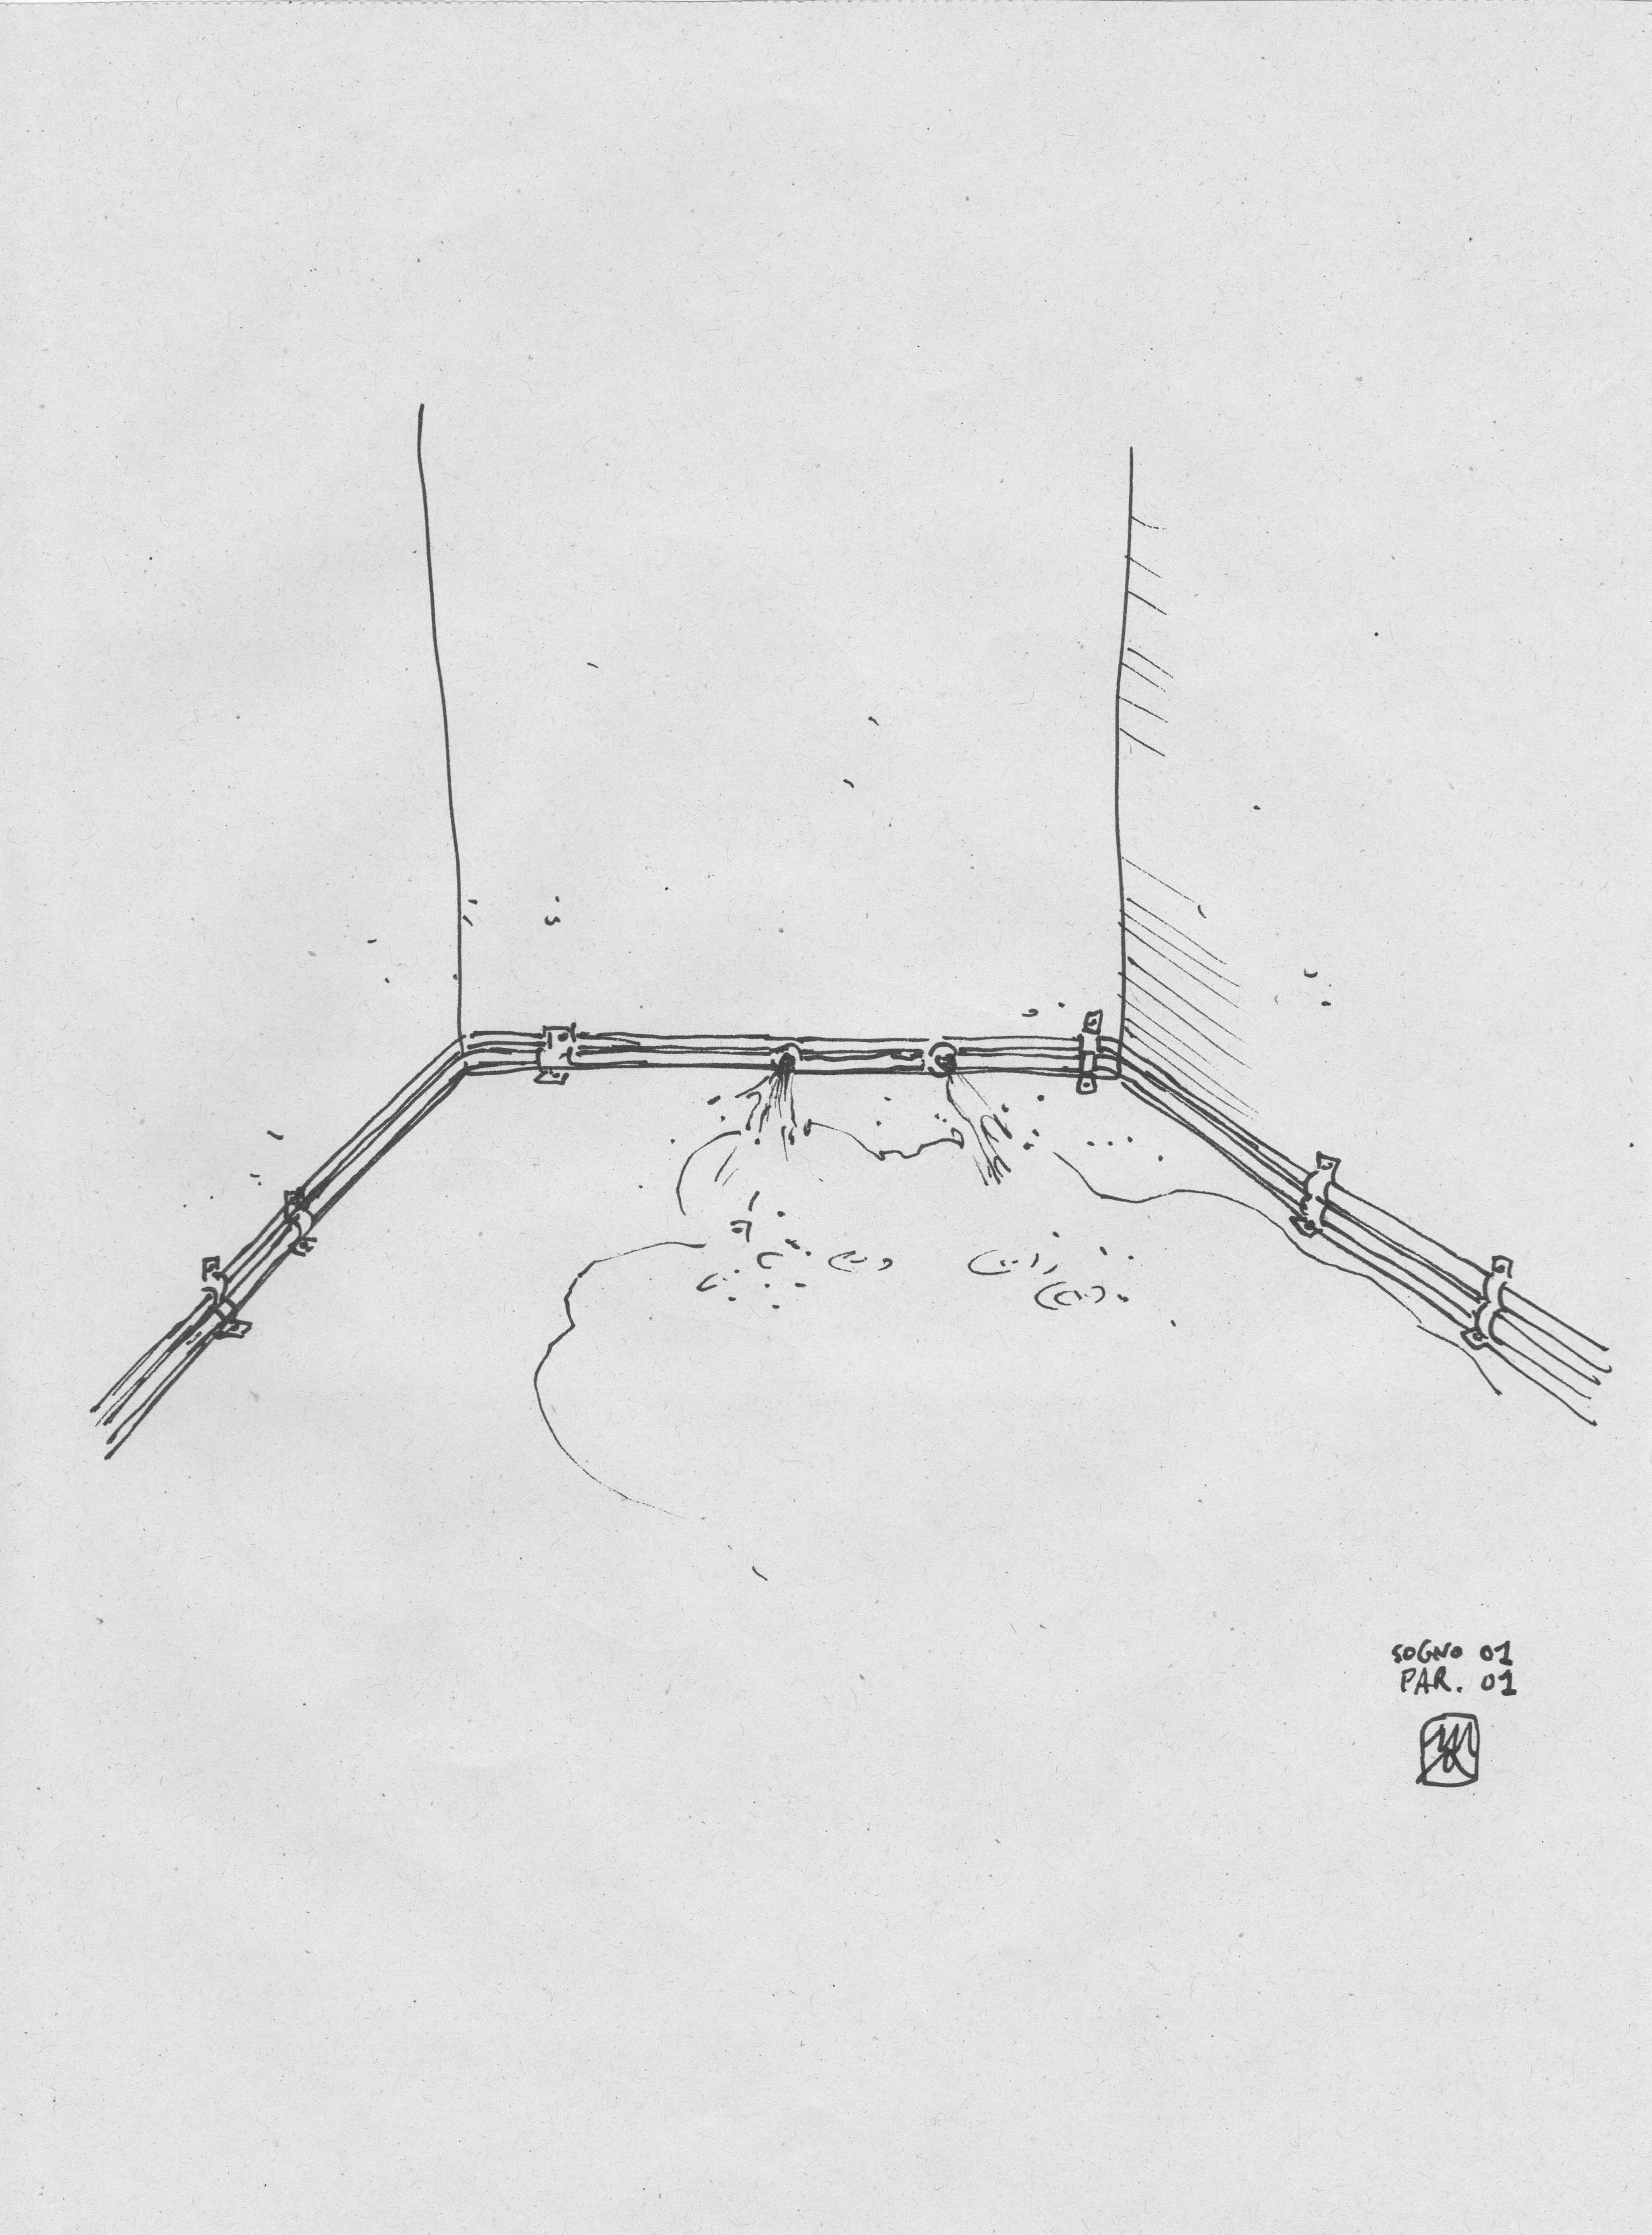 sogno01par01 - china su carta - A4